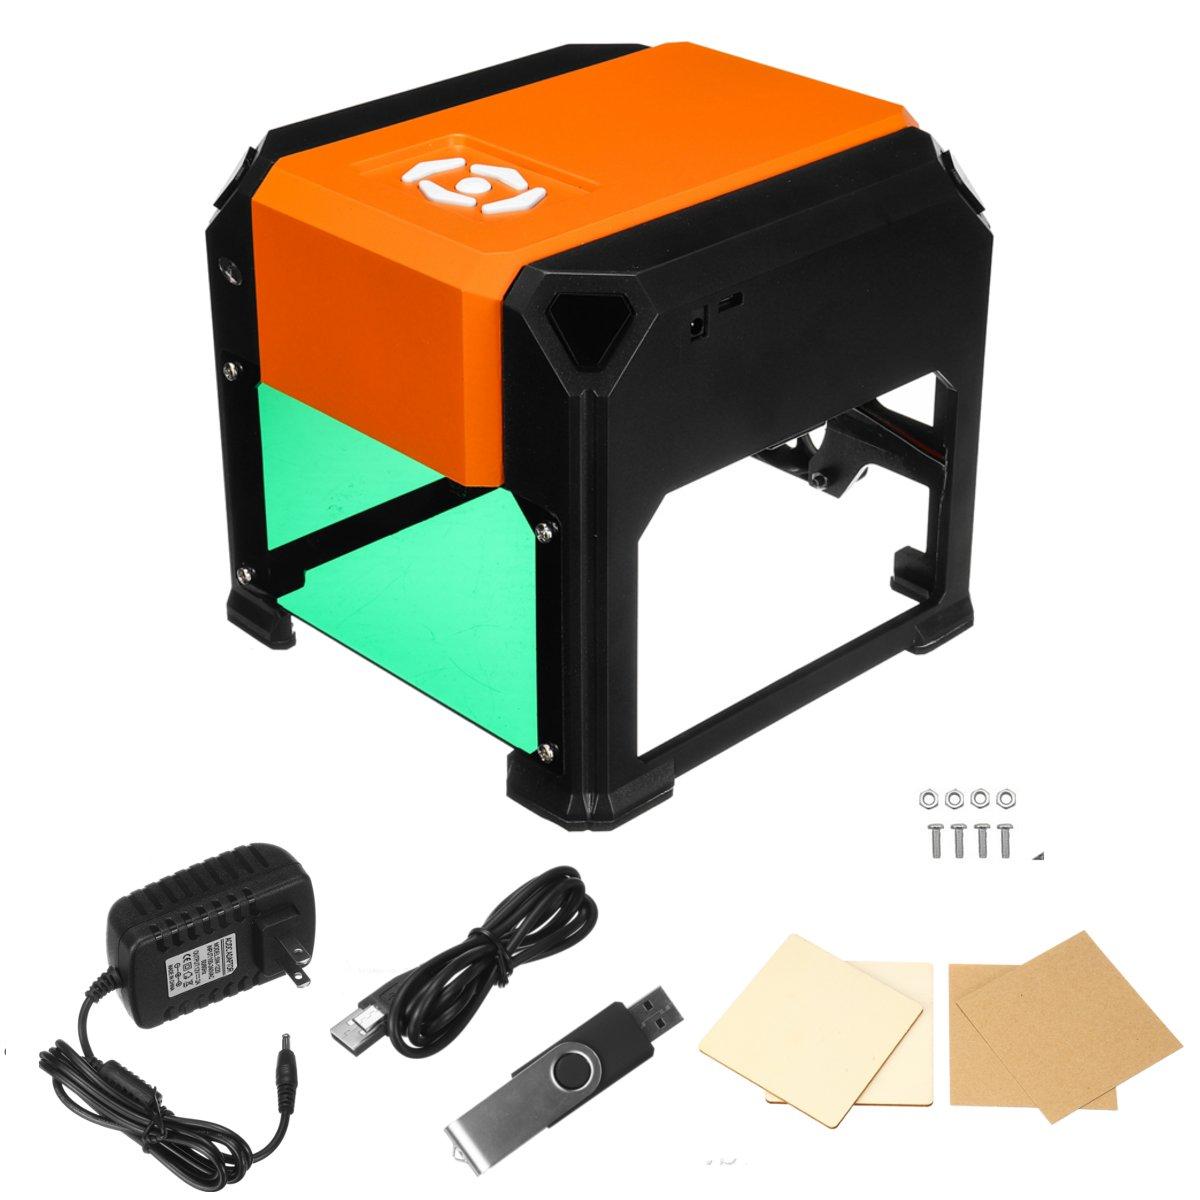 3000mW USB Bluetooth Control Desktop Laser Engraving Machine DIY Logo Mark Printer Cutter CNC Laser Carving Machine 110-220V